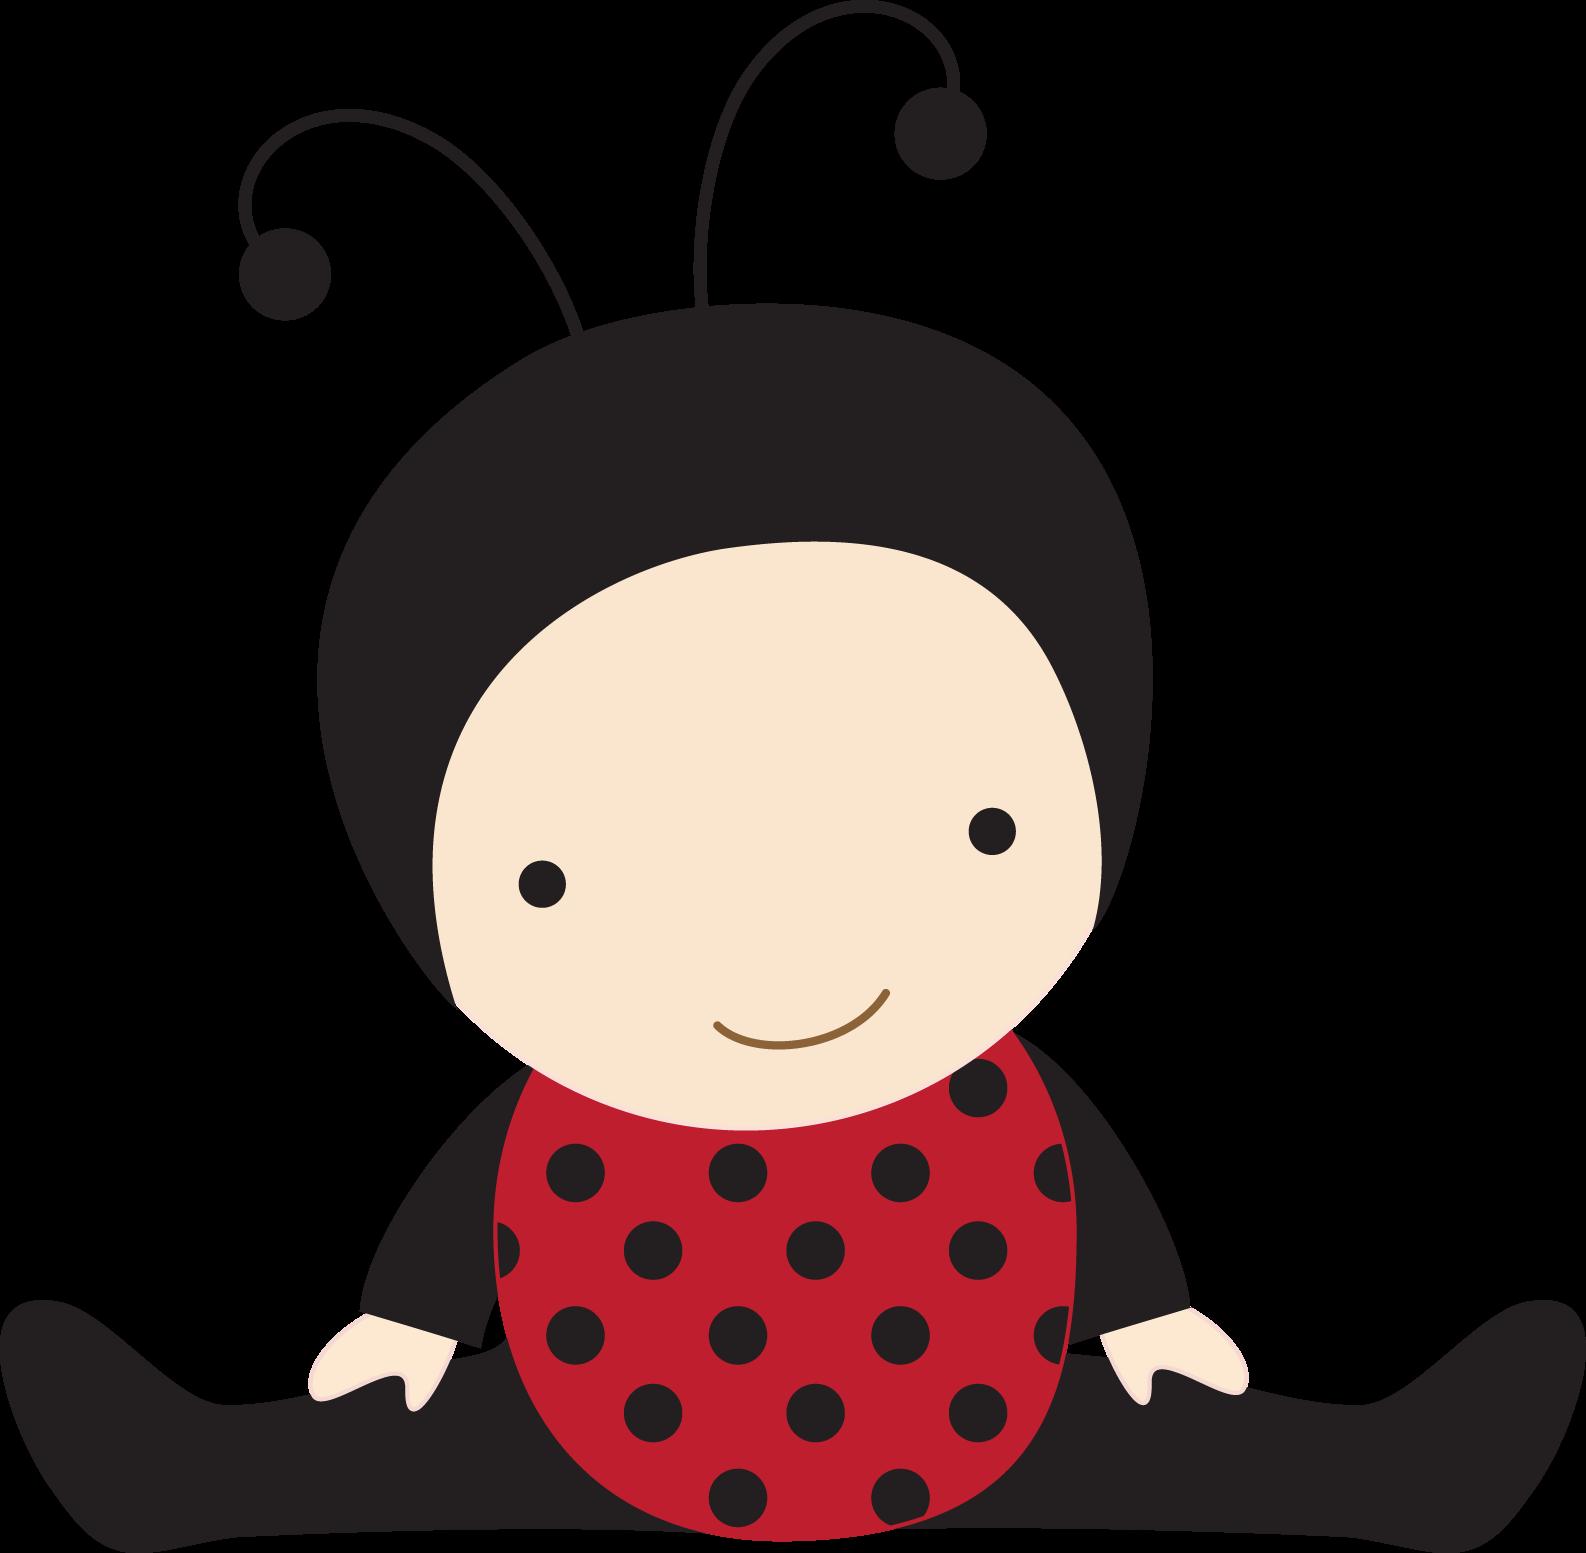 1586x1553 Baby Ladybug Clip Art. Oh My Baby!